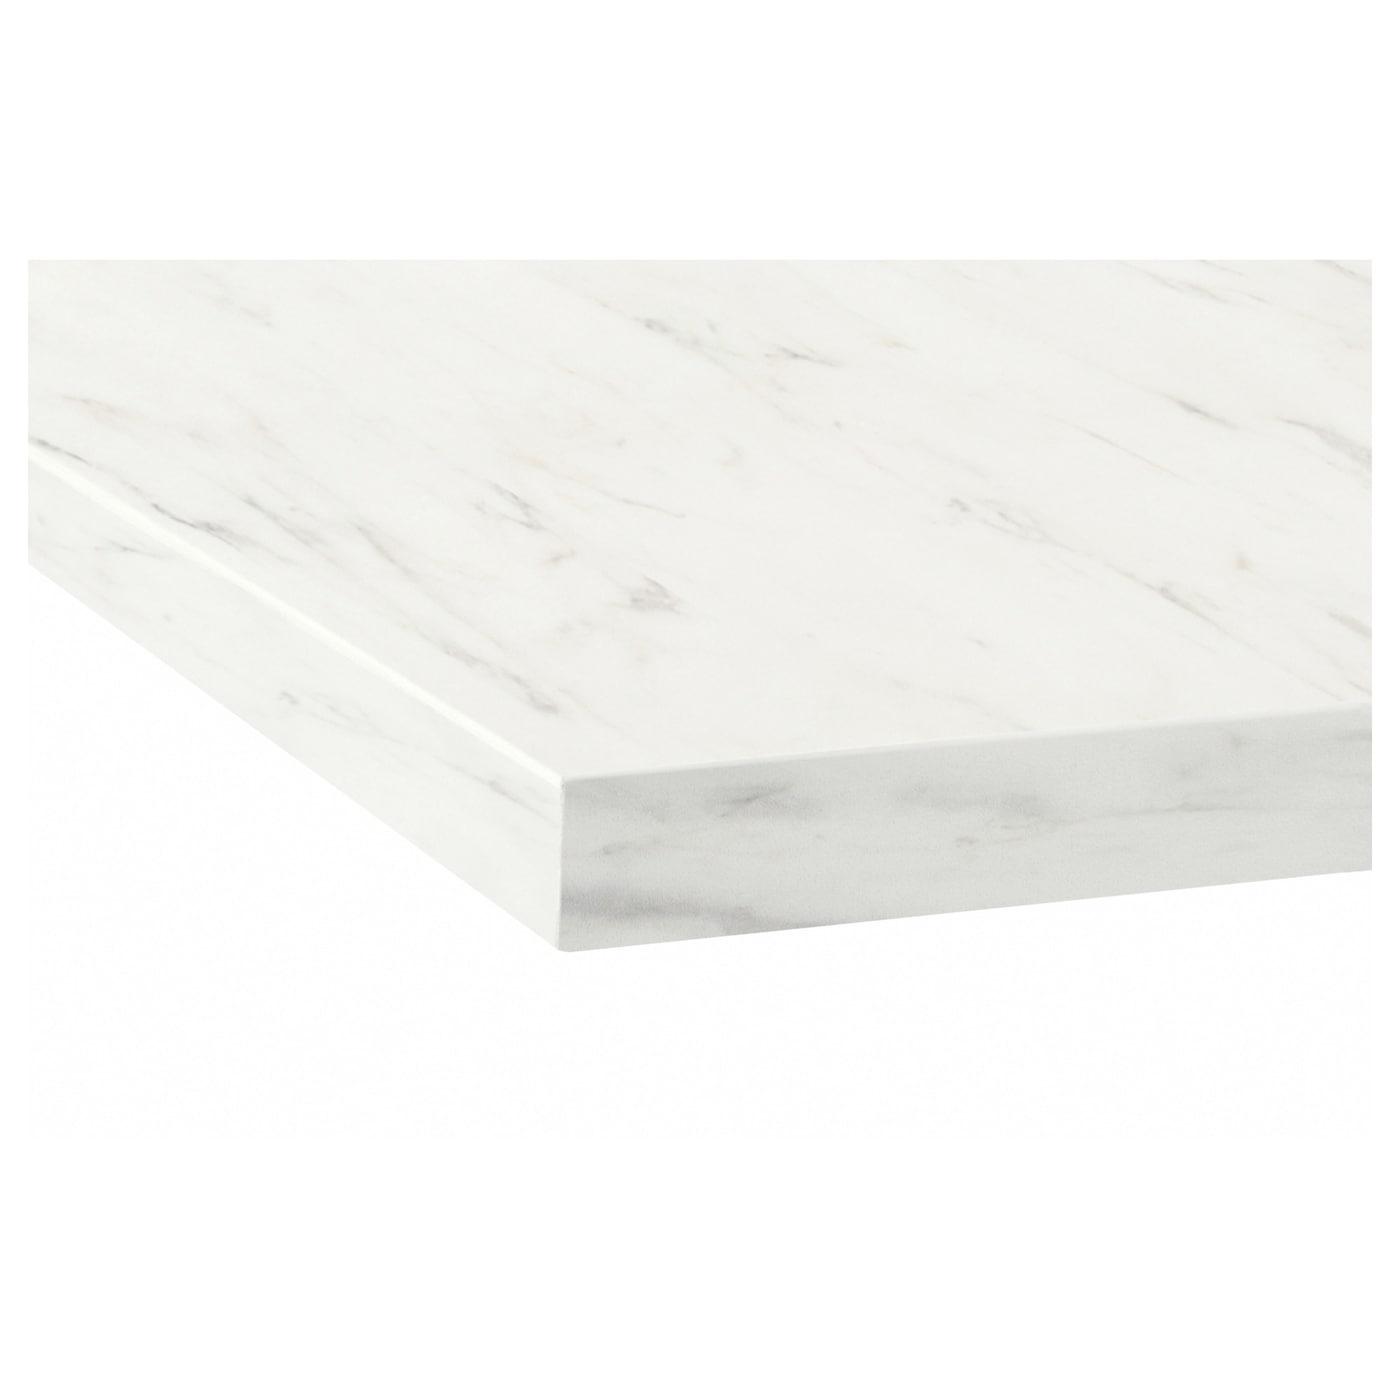 Ekbacken Plan De Travail Blanc Marbre Stratifie 246x2 Ikea